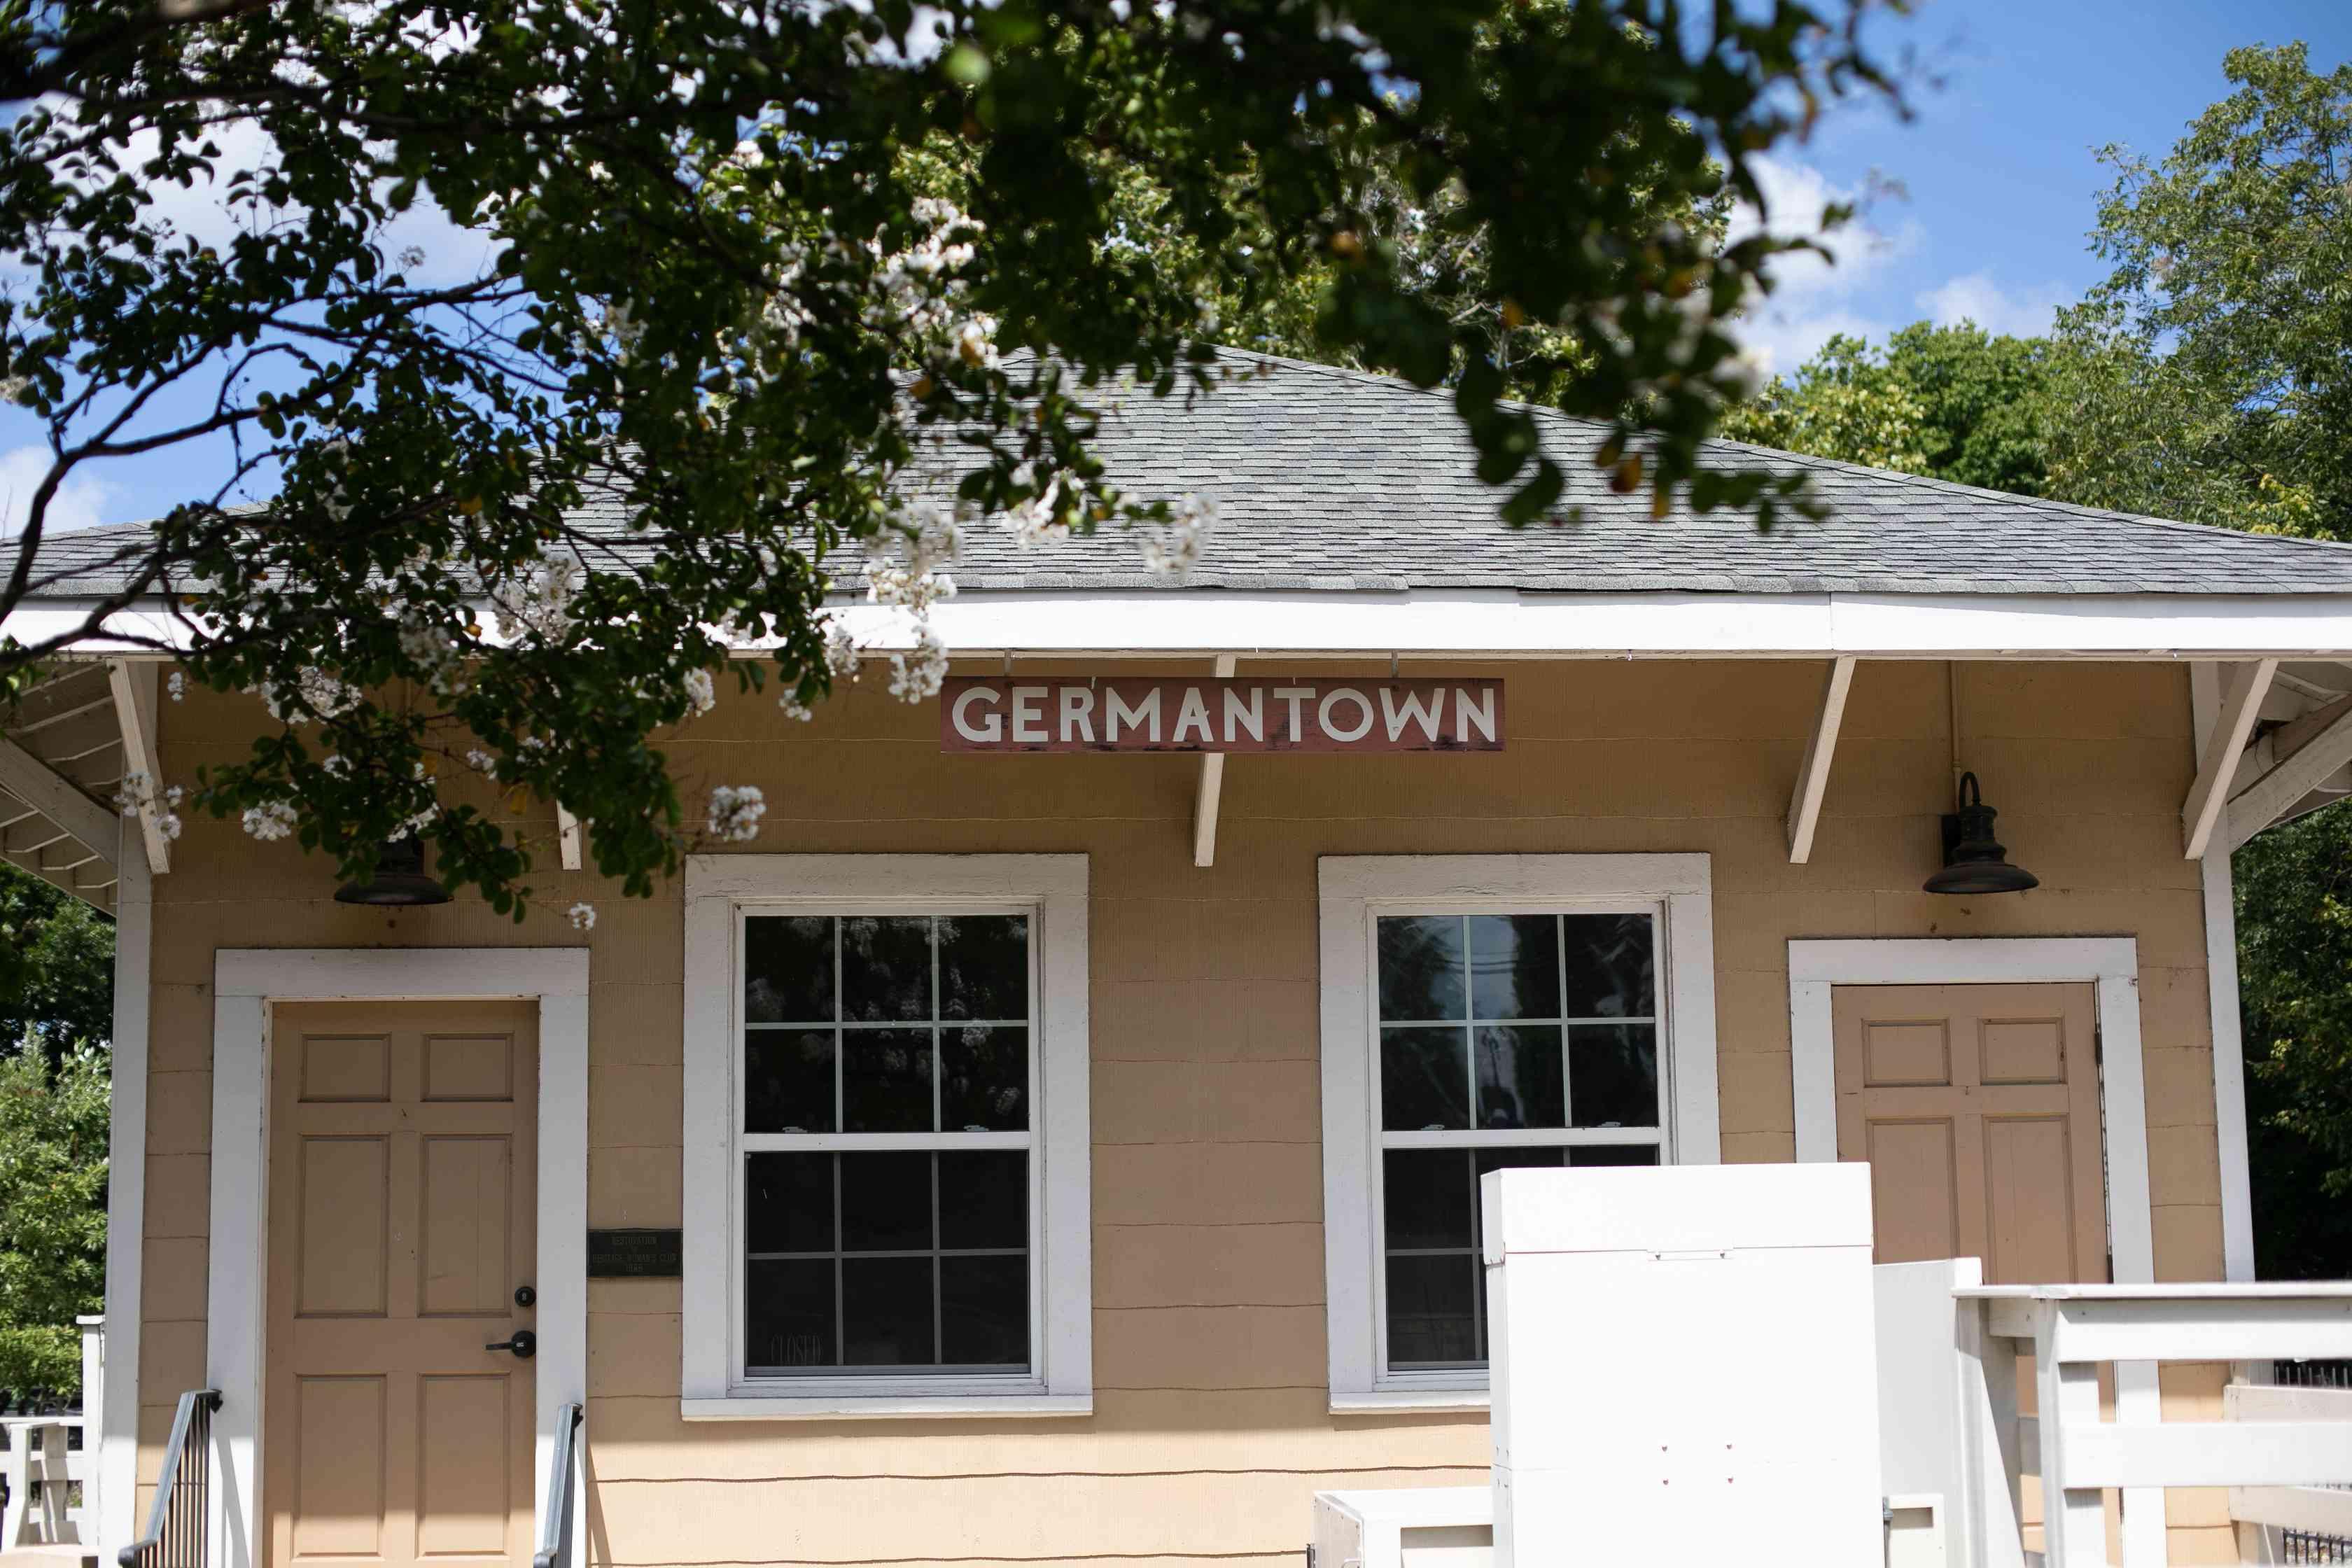 Germantown, Memphis, Tennessee